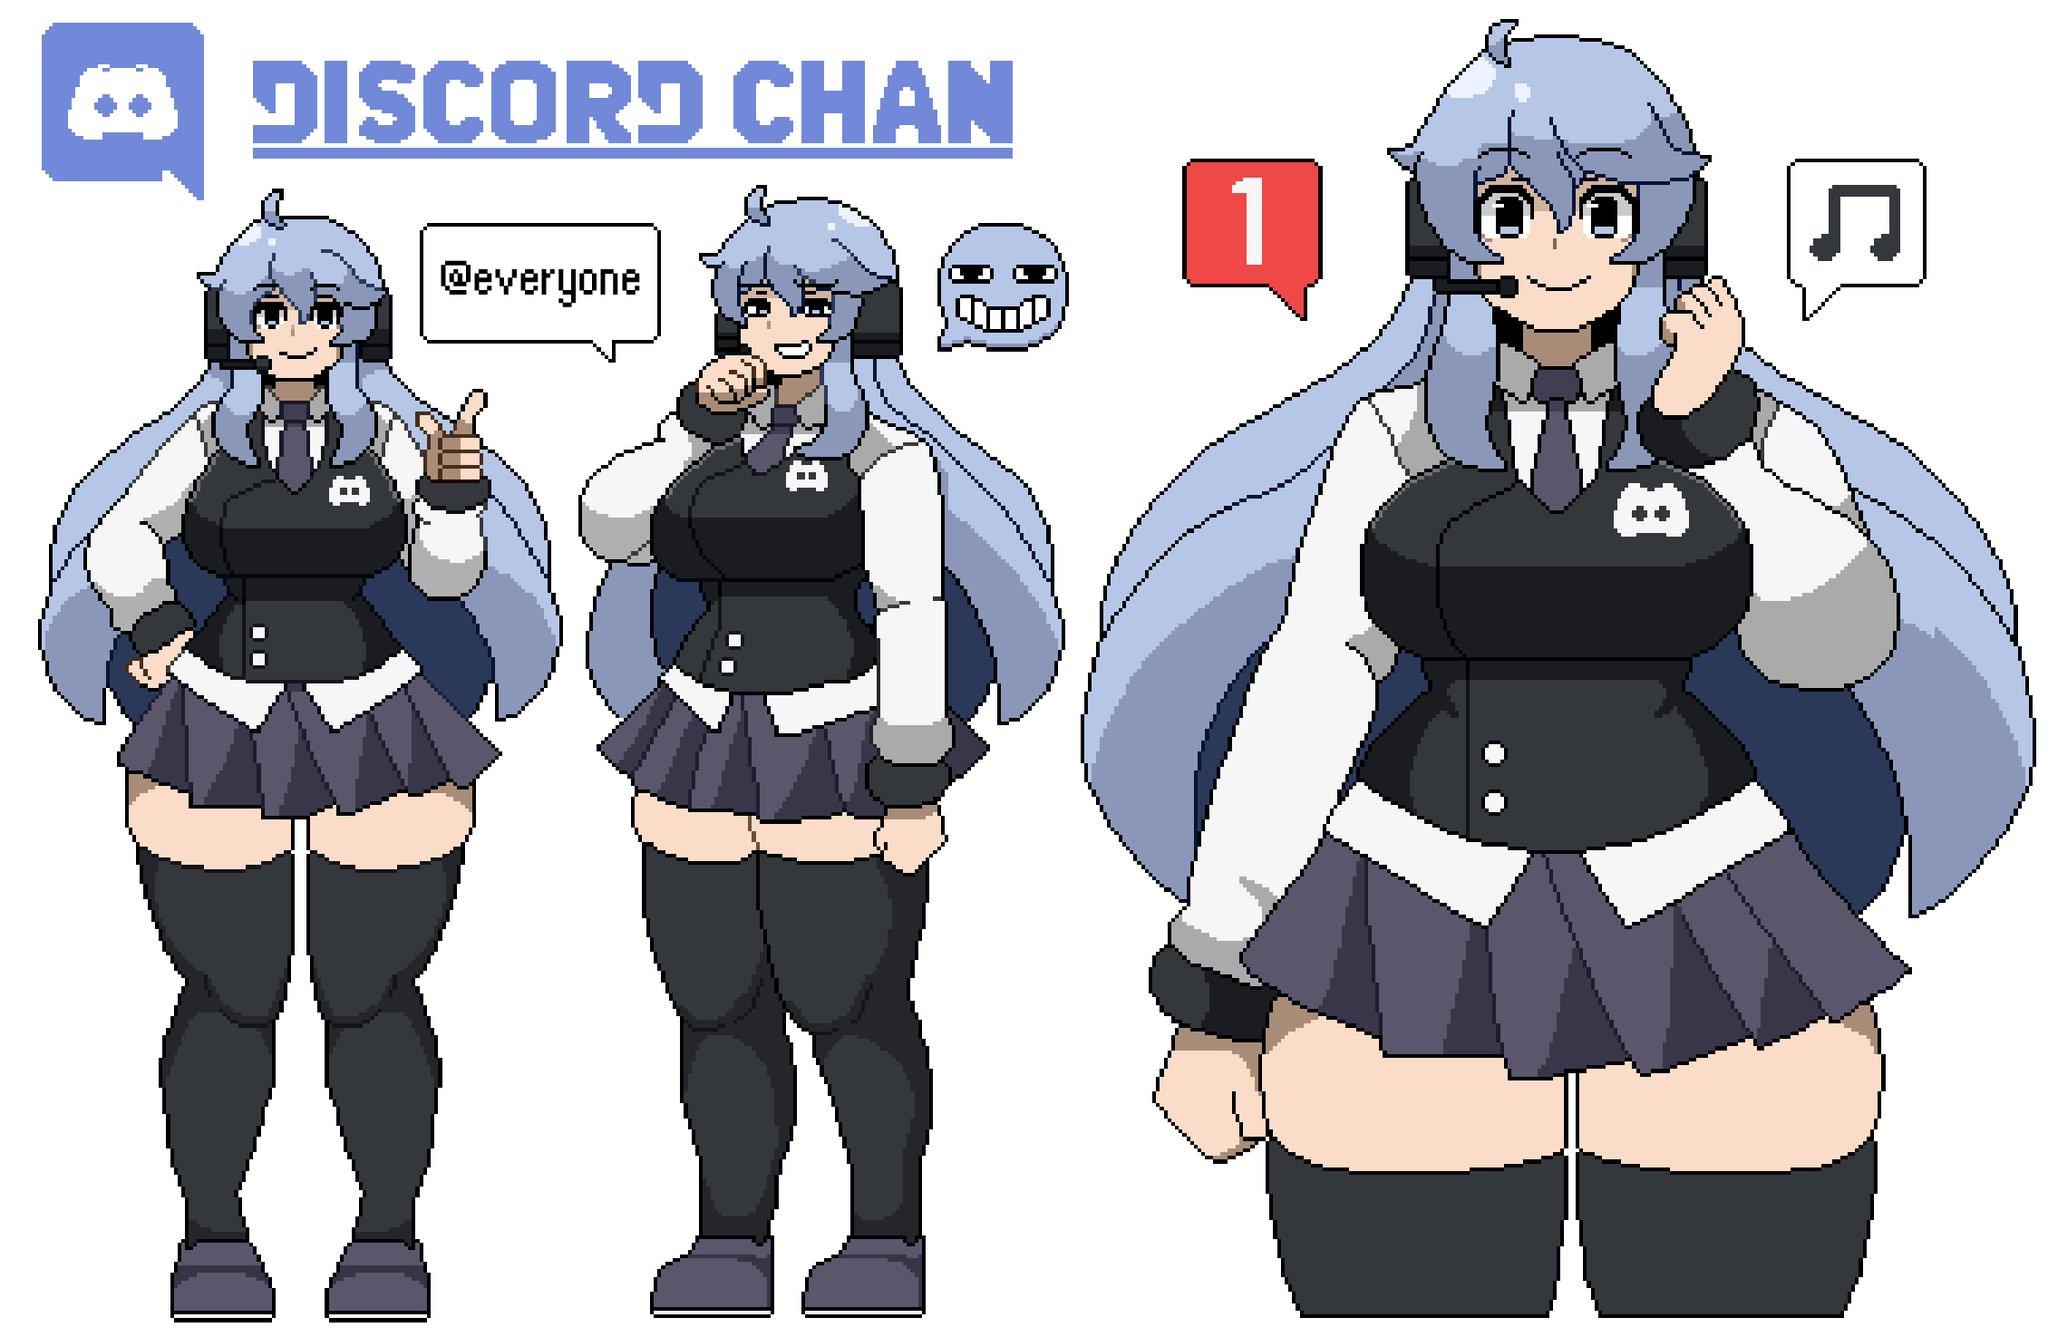 fbf3a02c81c Discord Chan by HollowGrimal